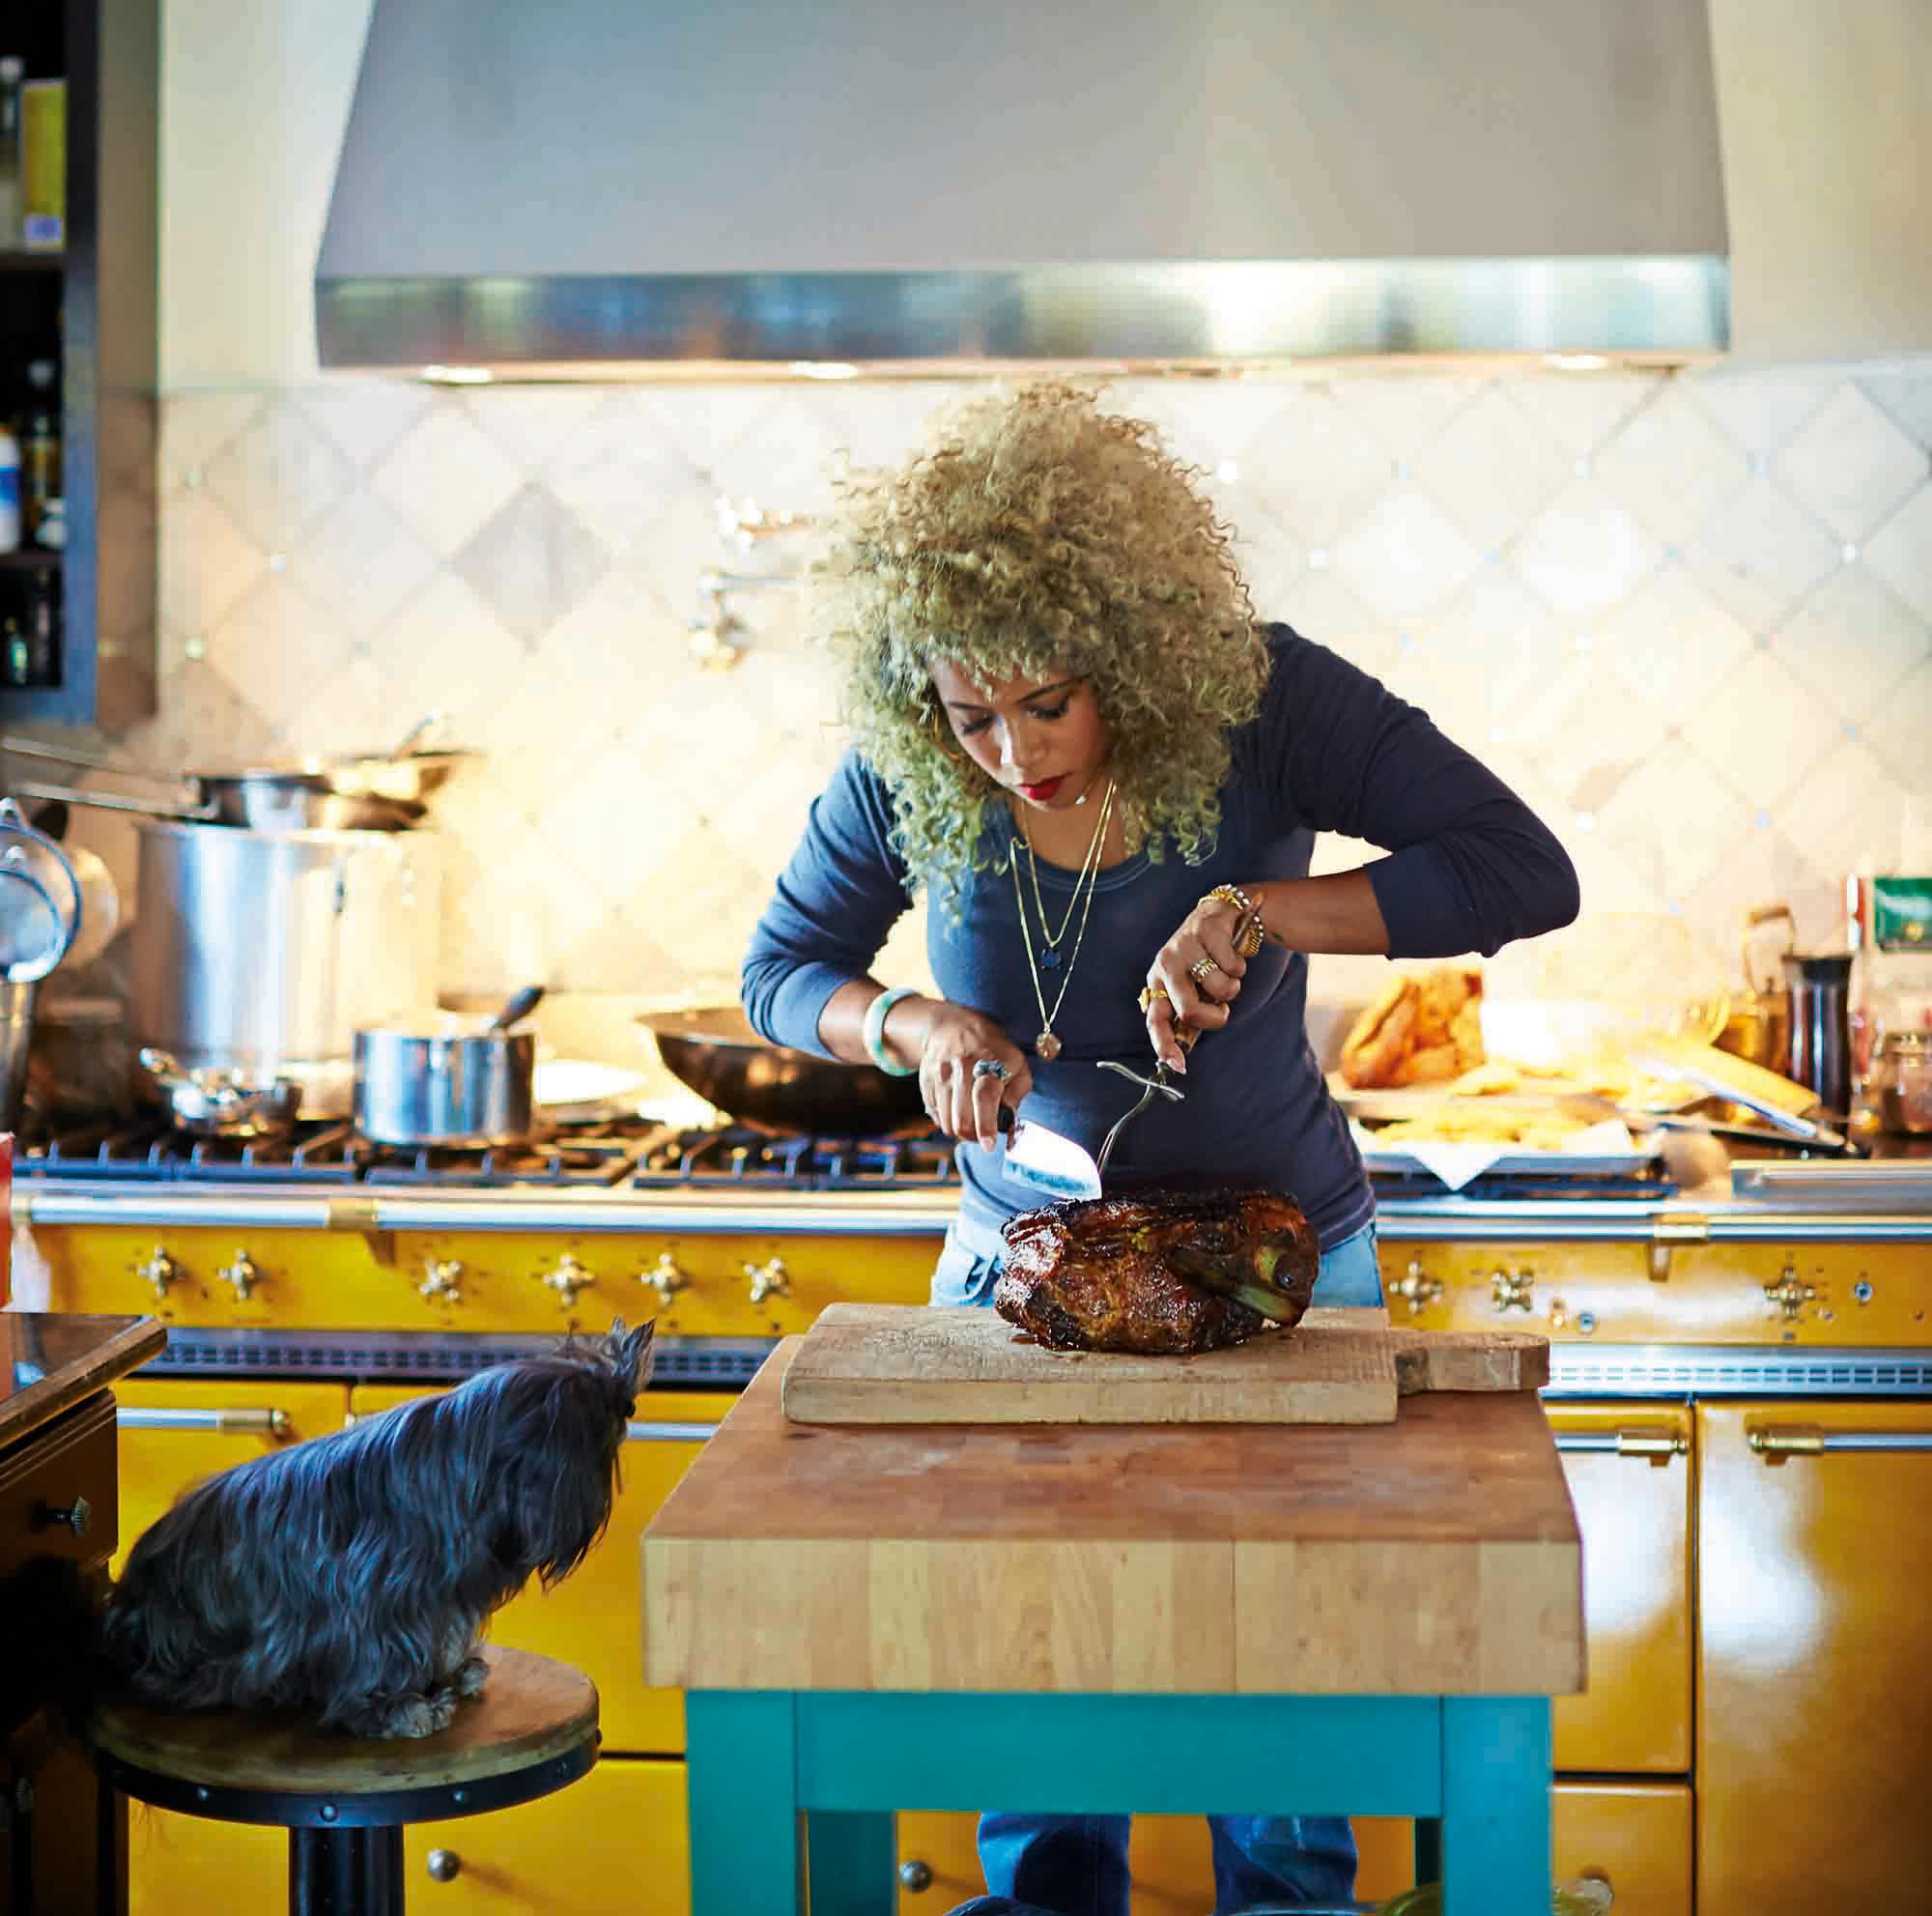 kelis-in-kitchen